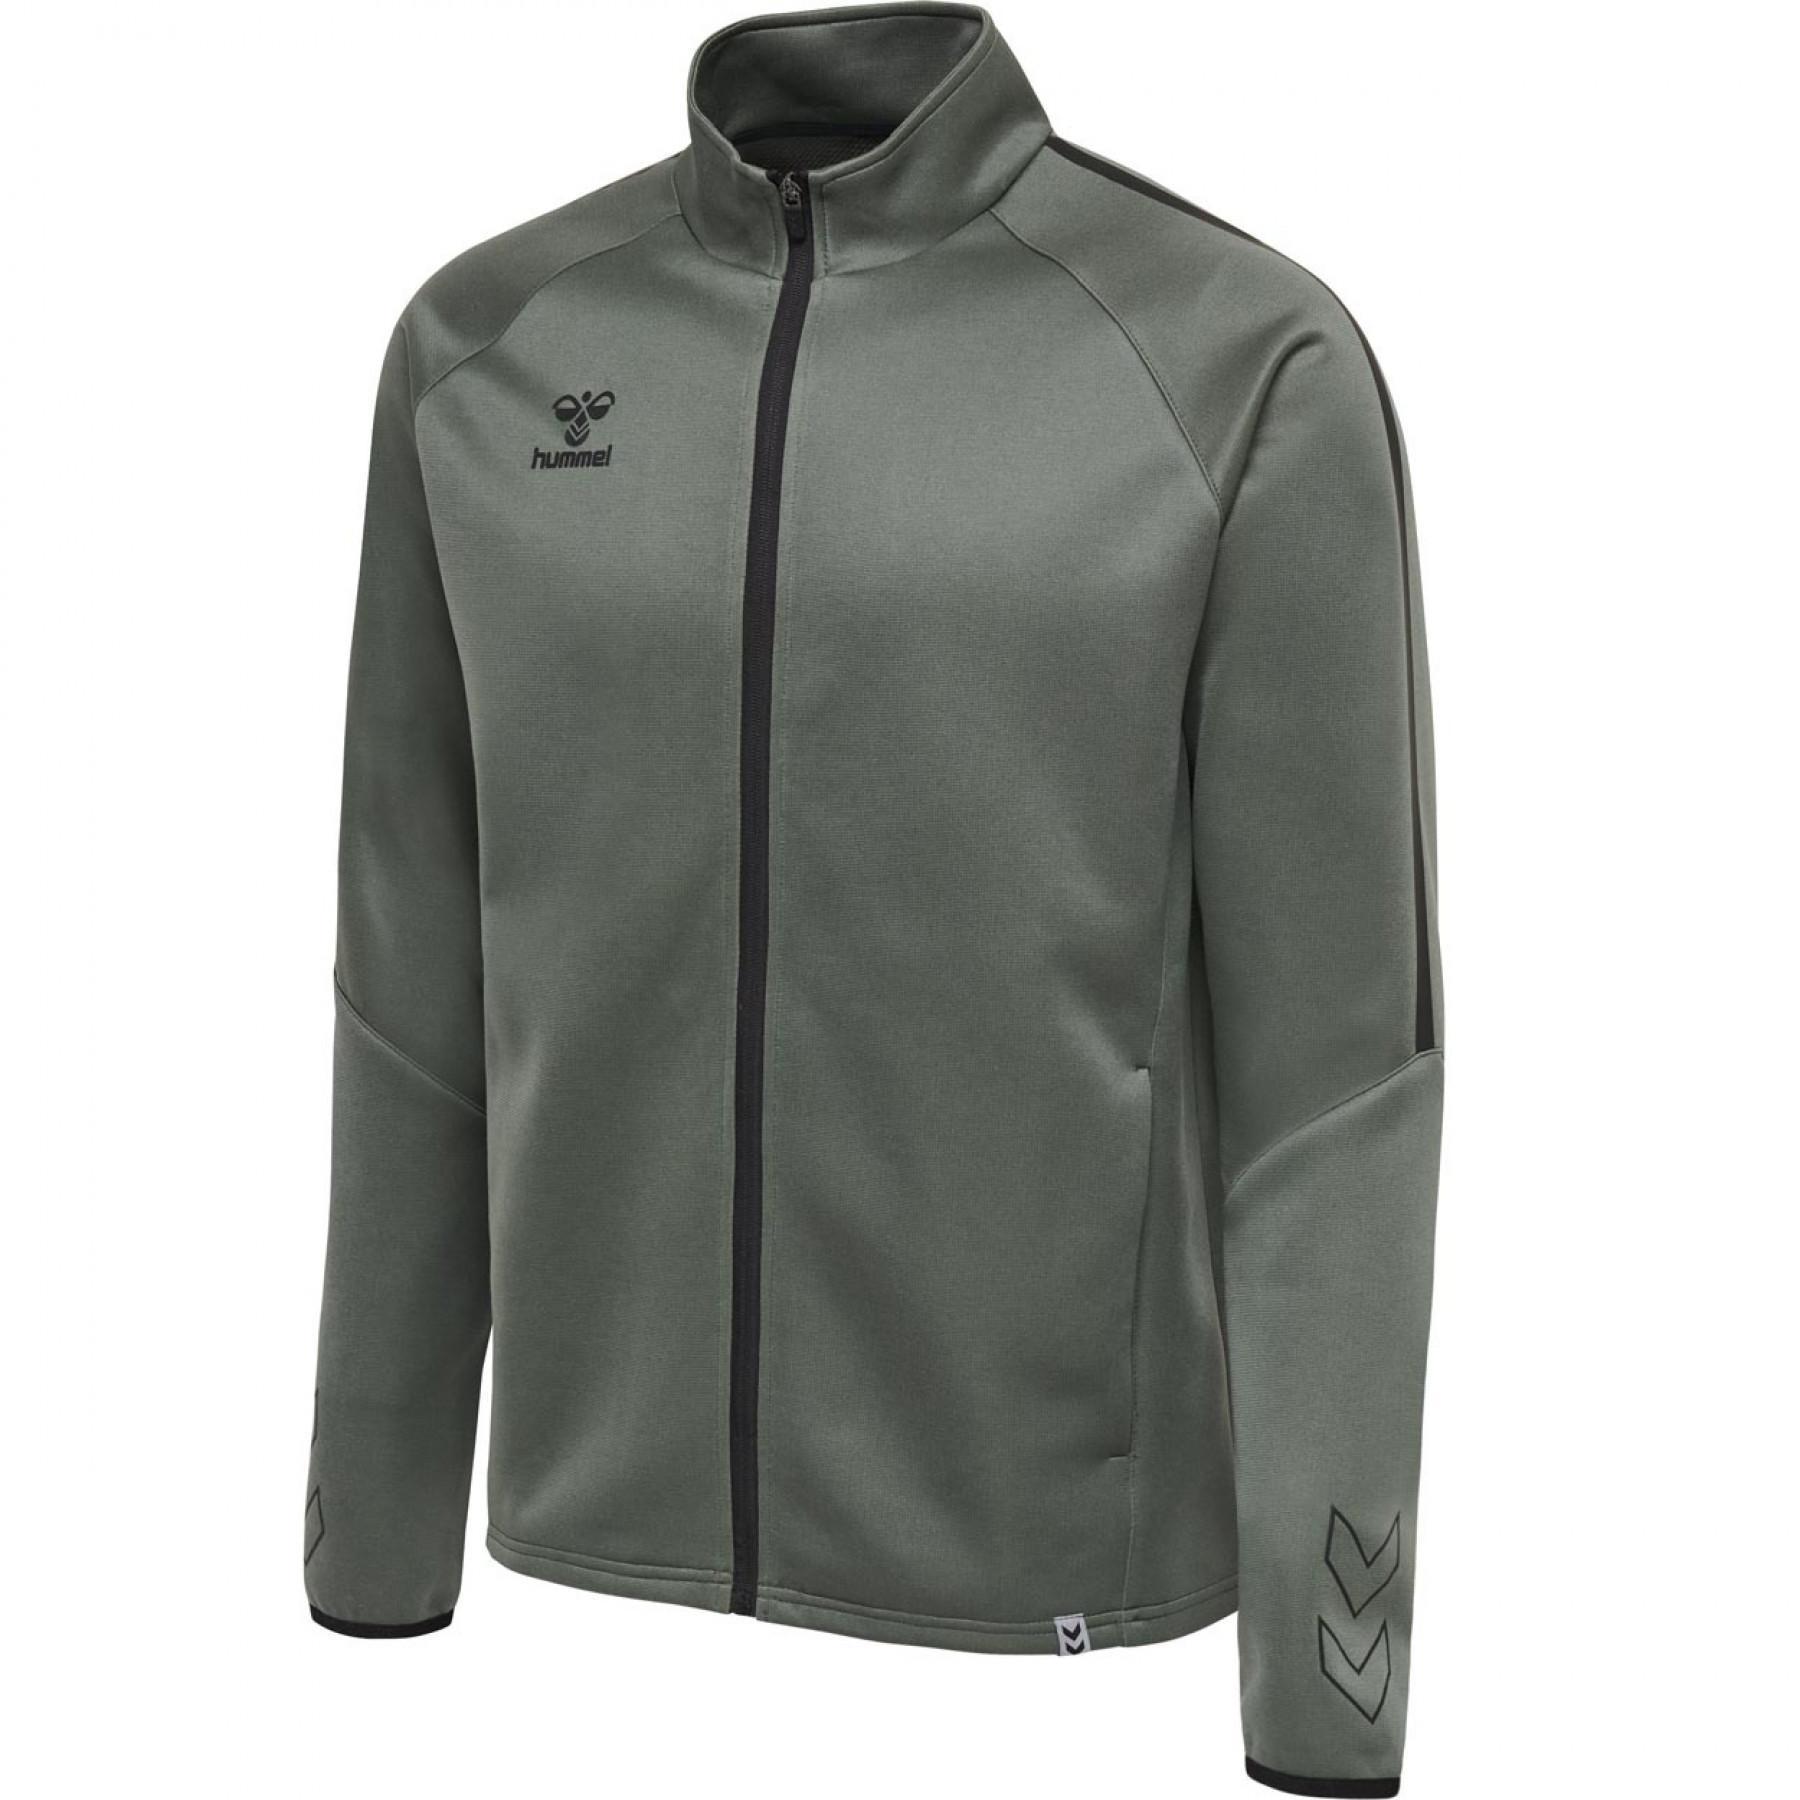 Hummel zip jacket Cima